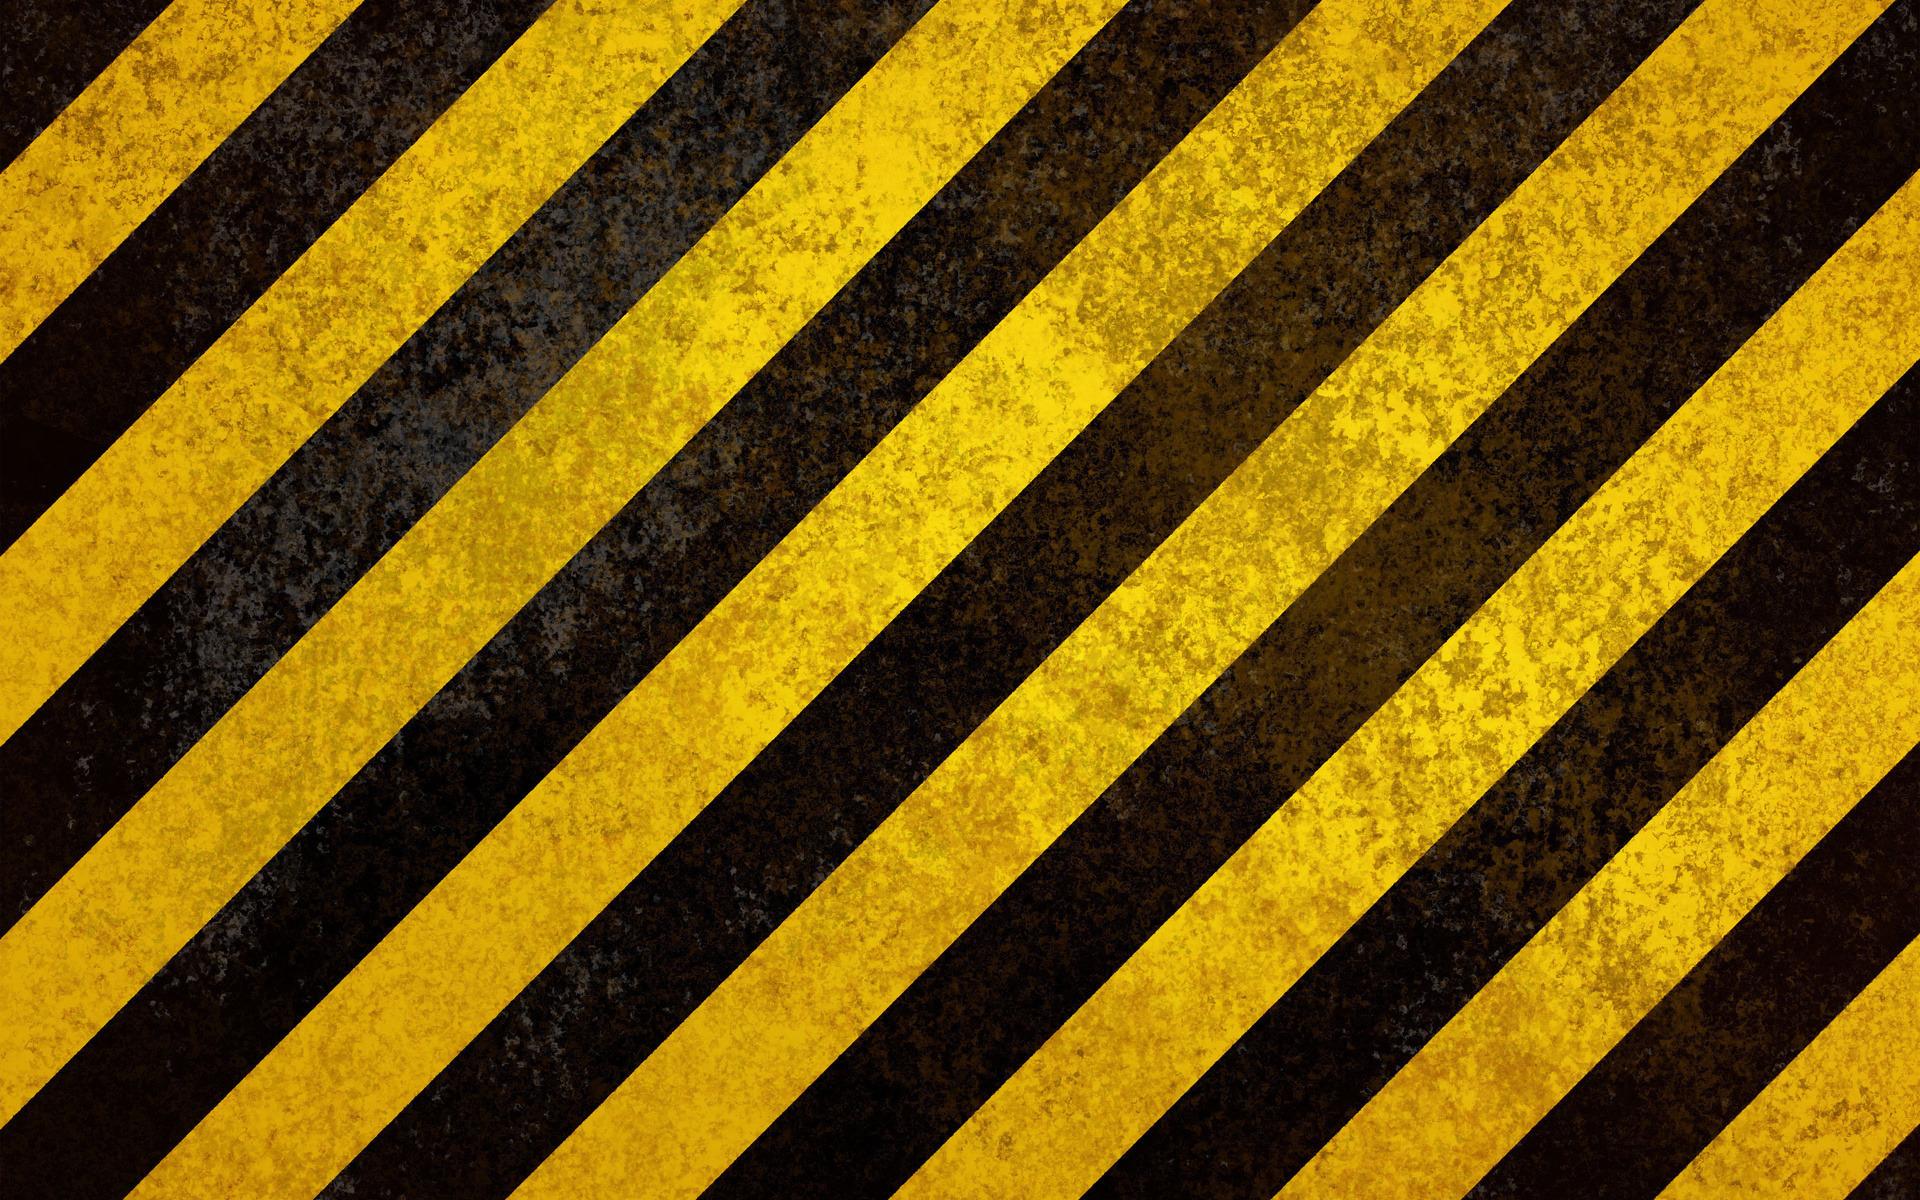 yellow hd wallpaper background image 1920x1200 id 279231